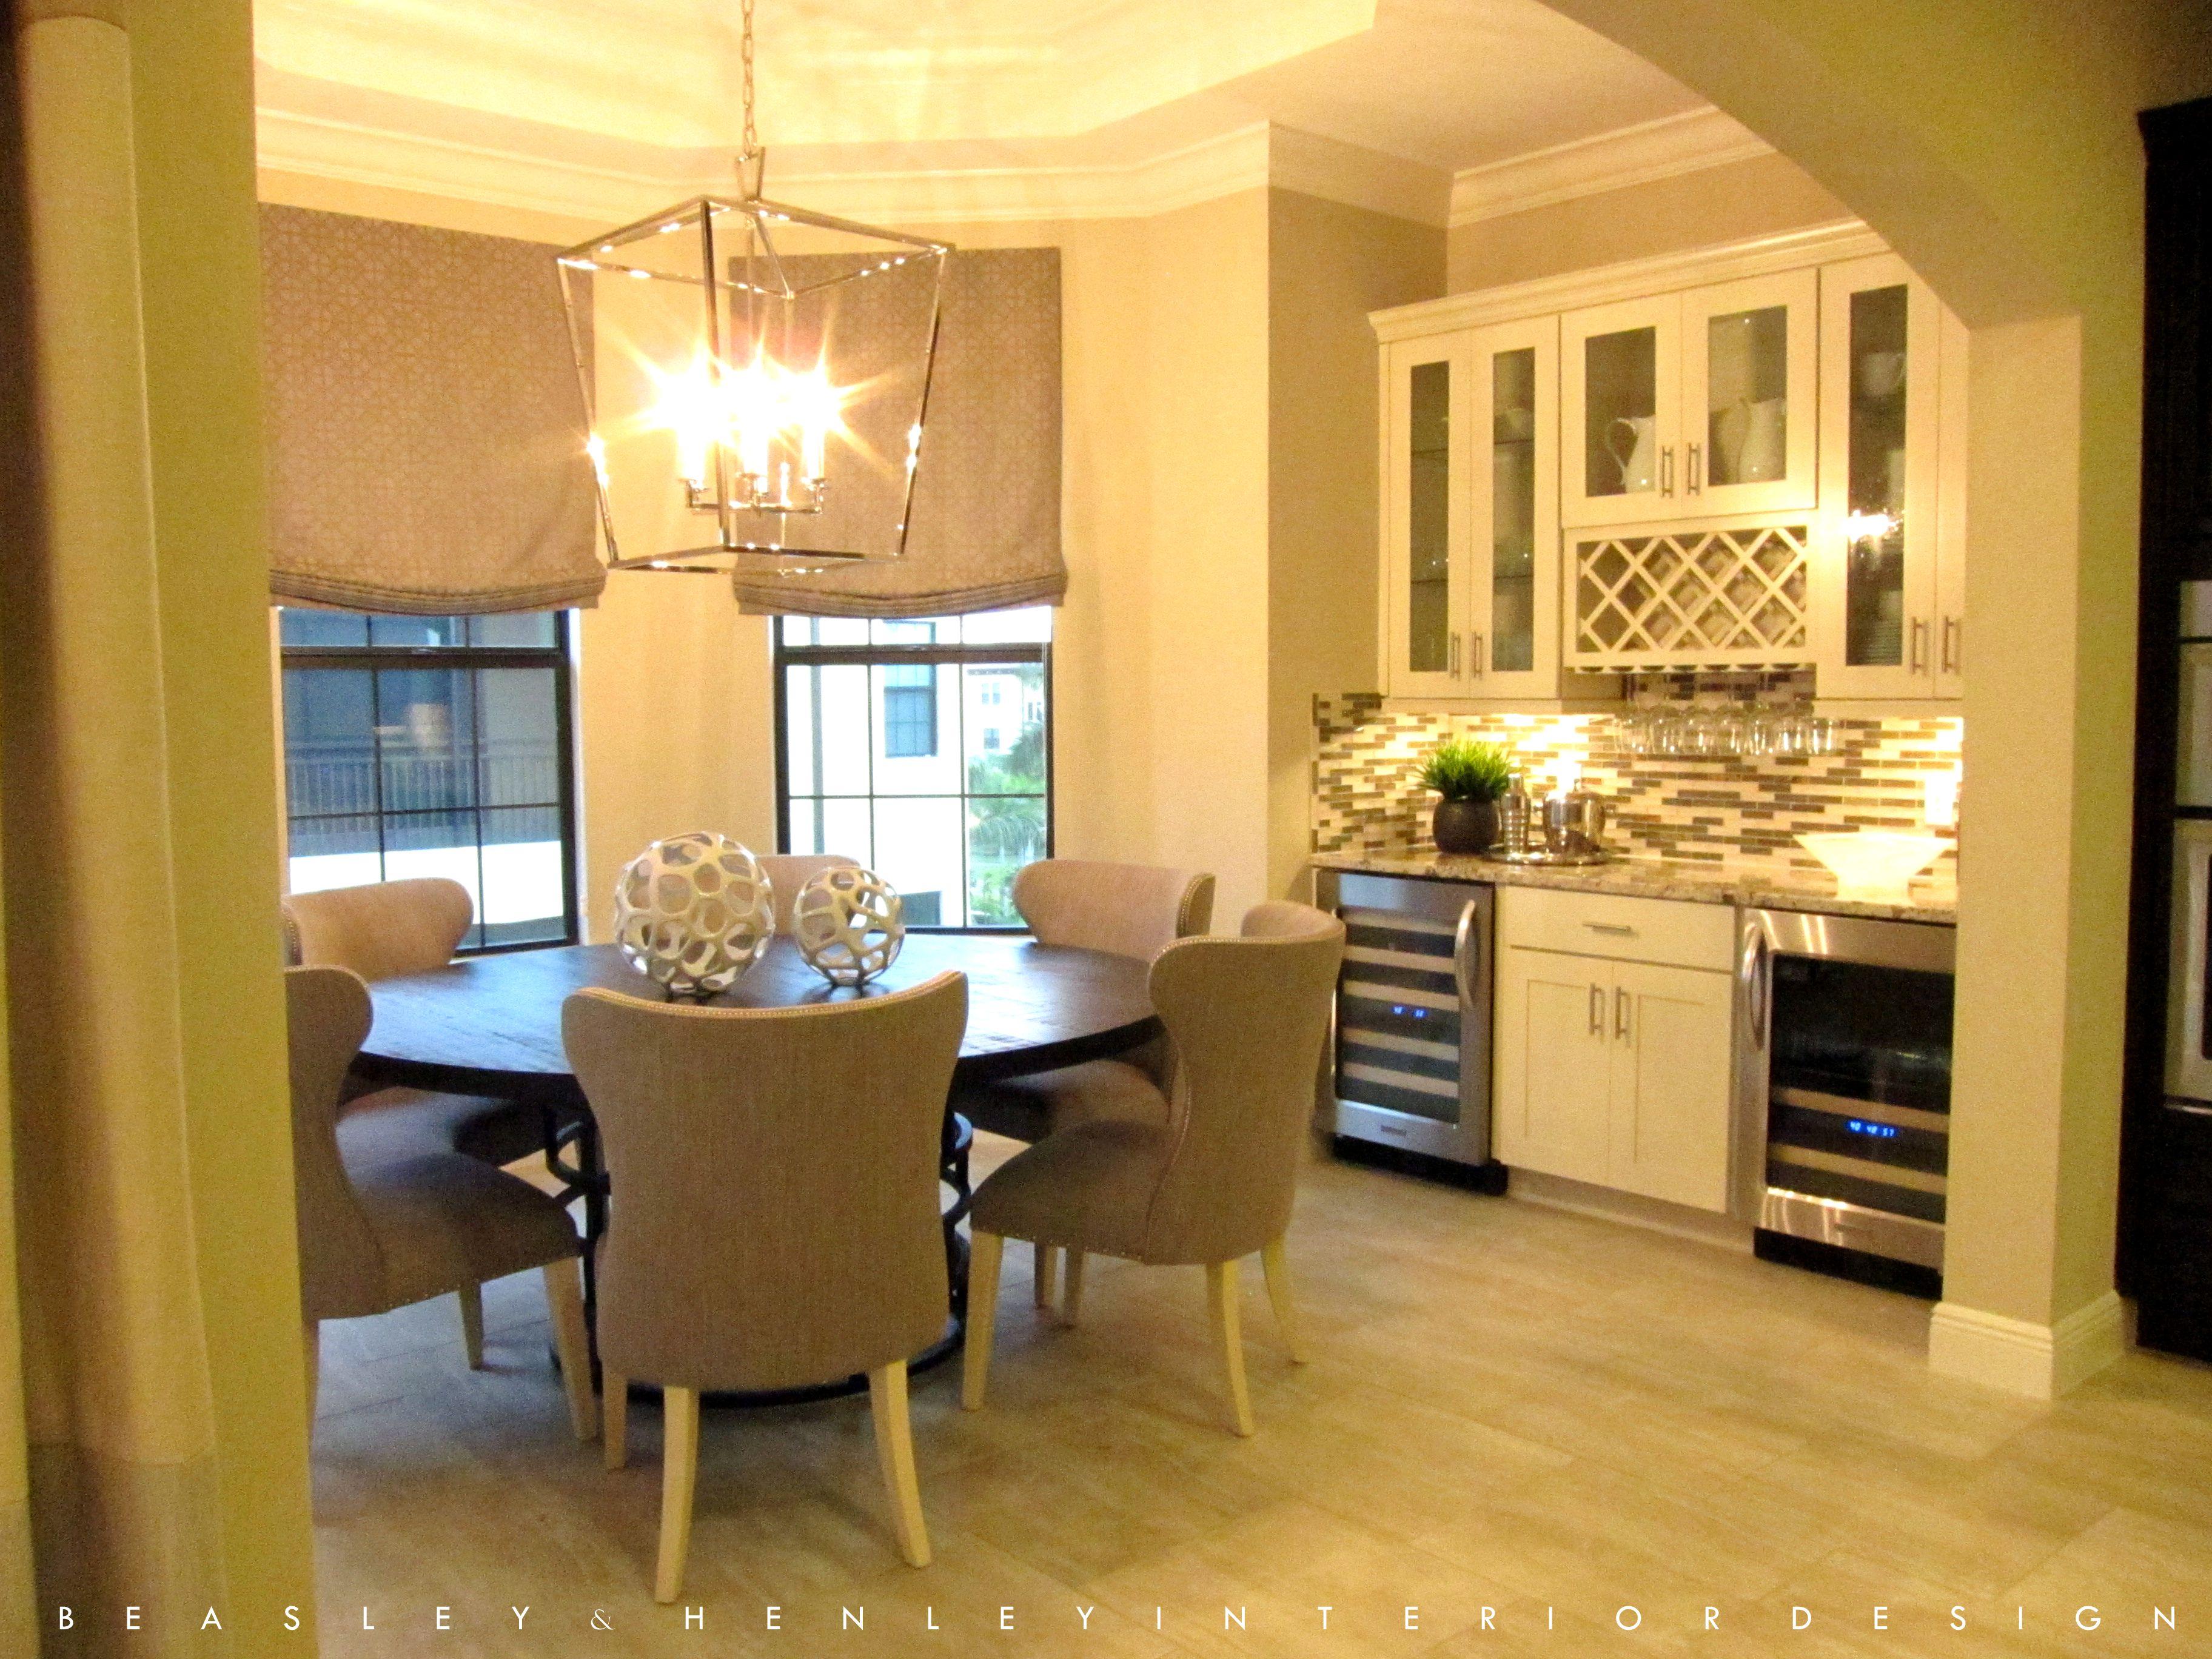 Kitchen Design Ideas By Interior Designers From Naples, FL. Http://www